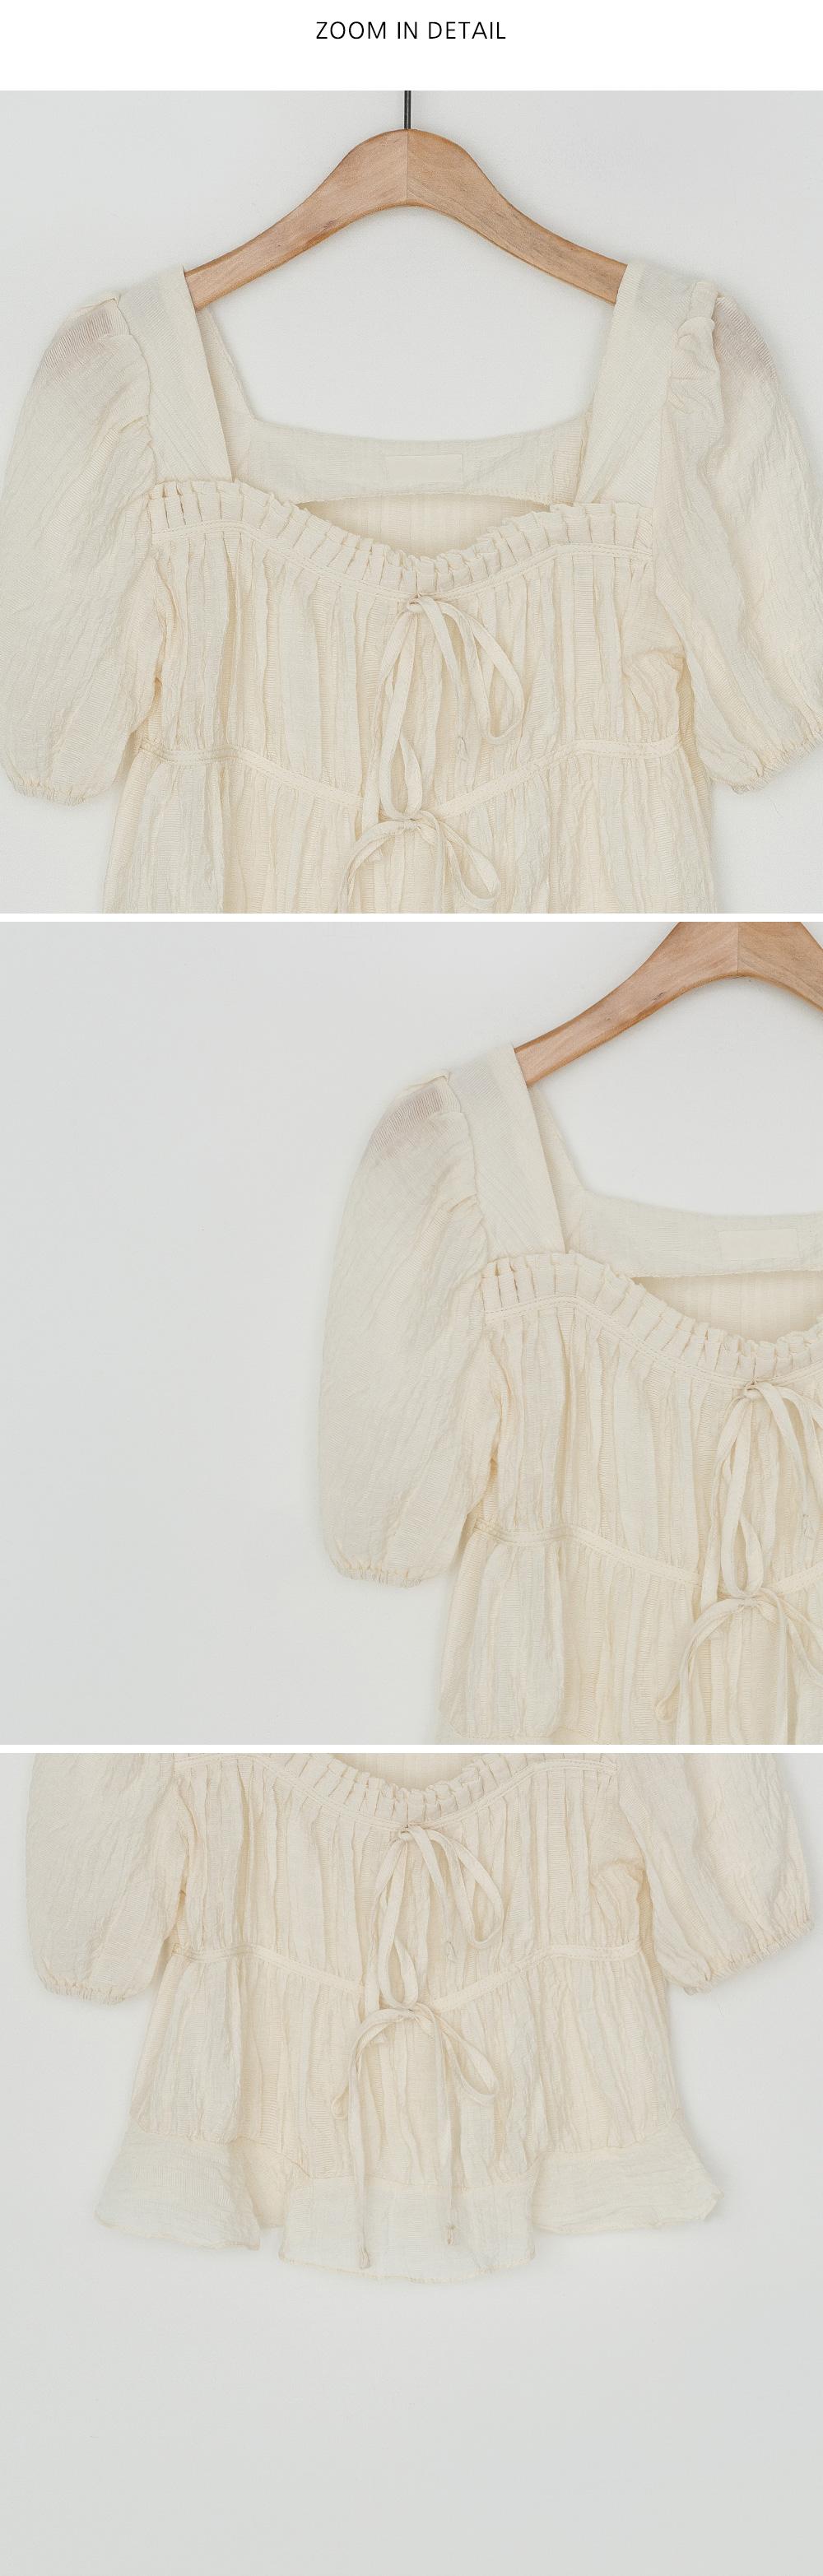 Puff sleeve shirring crop blouse